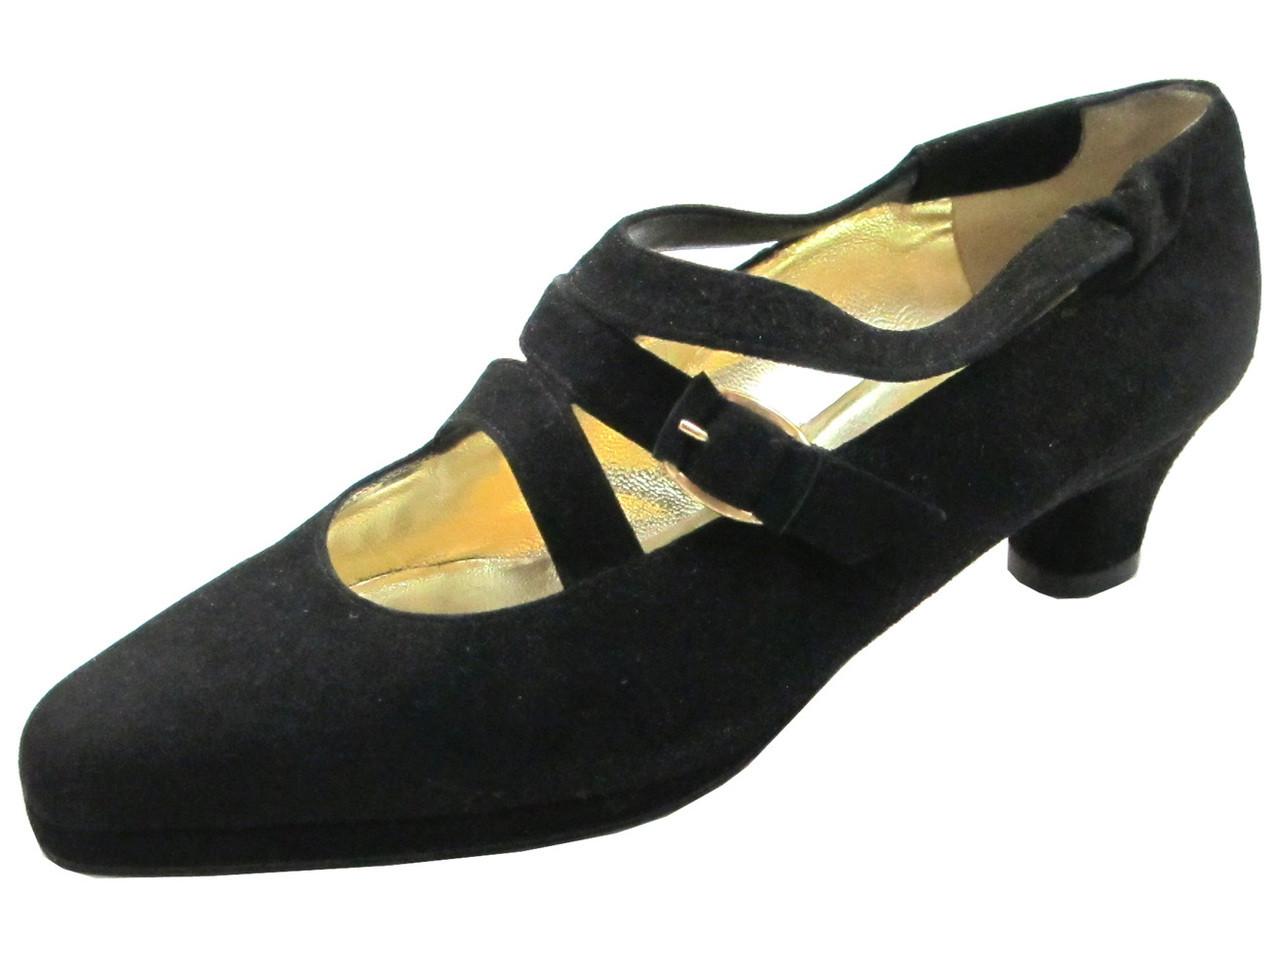 ea953377d06 Linea Barbarella 4028 Women s Low Heel Pumps in black suede with 3 straps